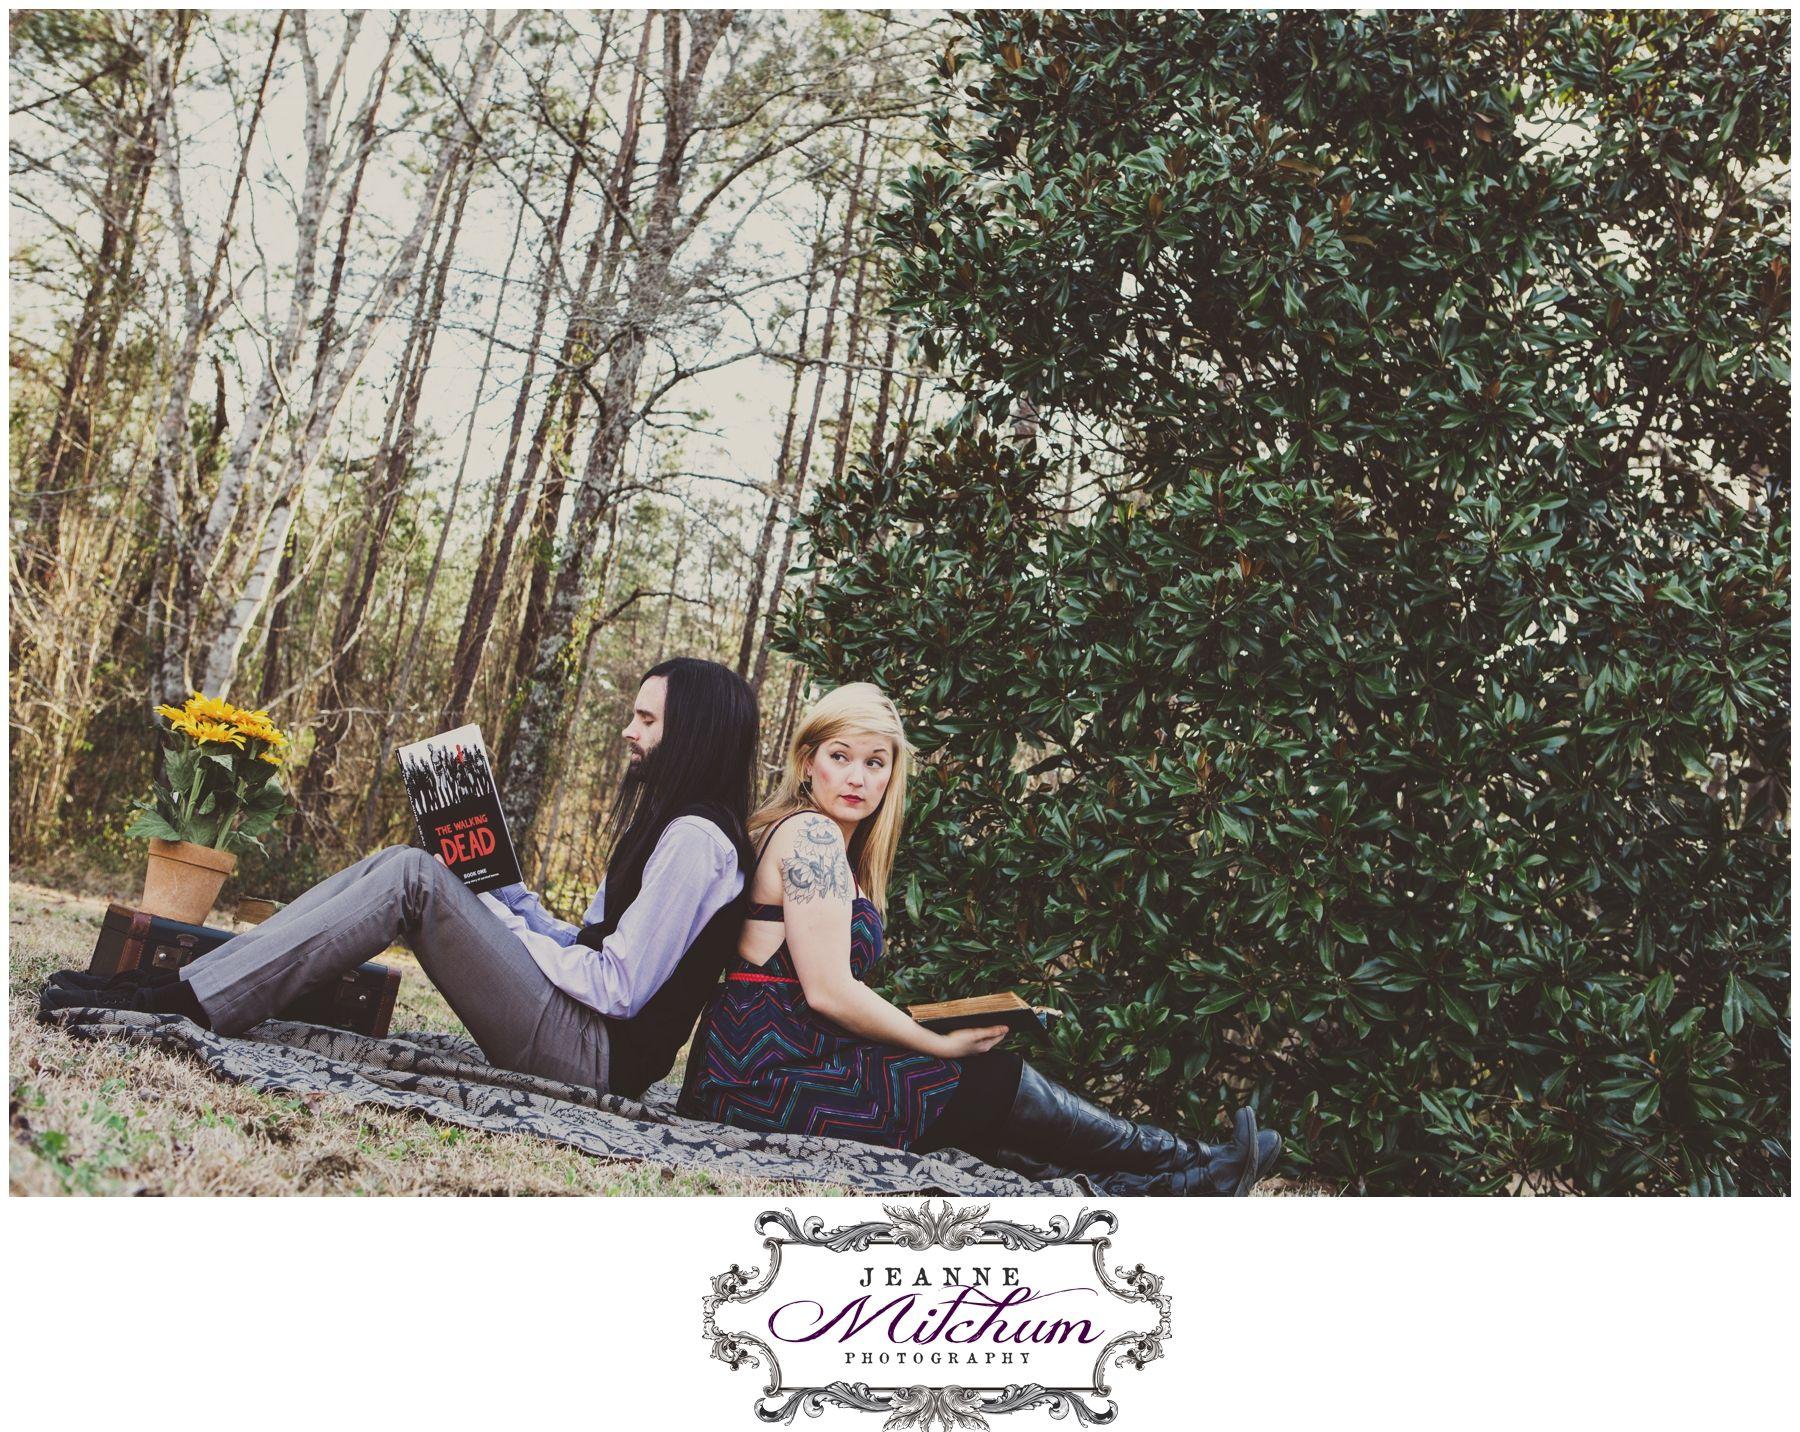 Lowcountry Weddings - Charleston Wedding Photographer - Jeanne Mitchum Photography